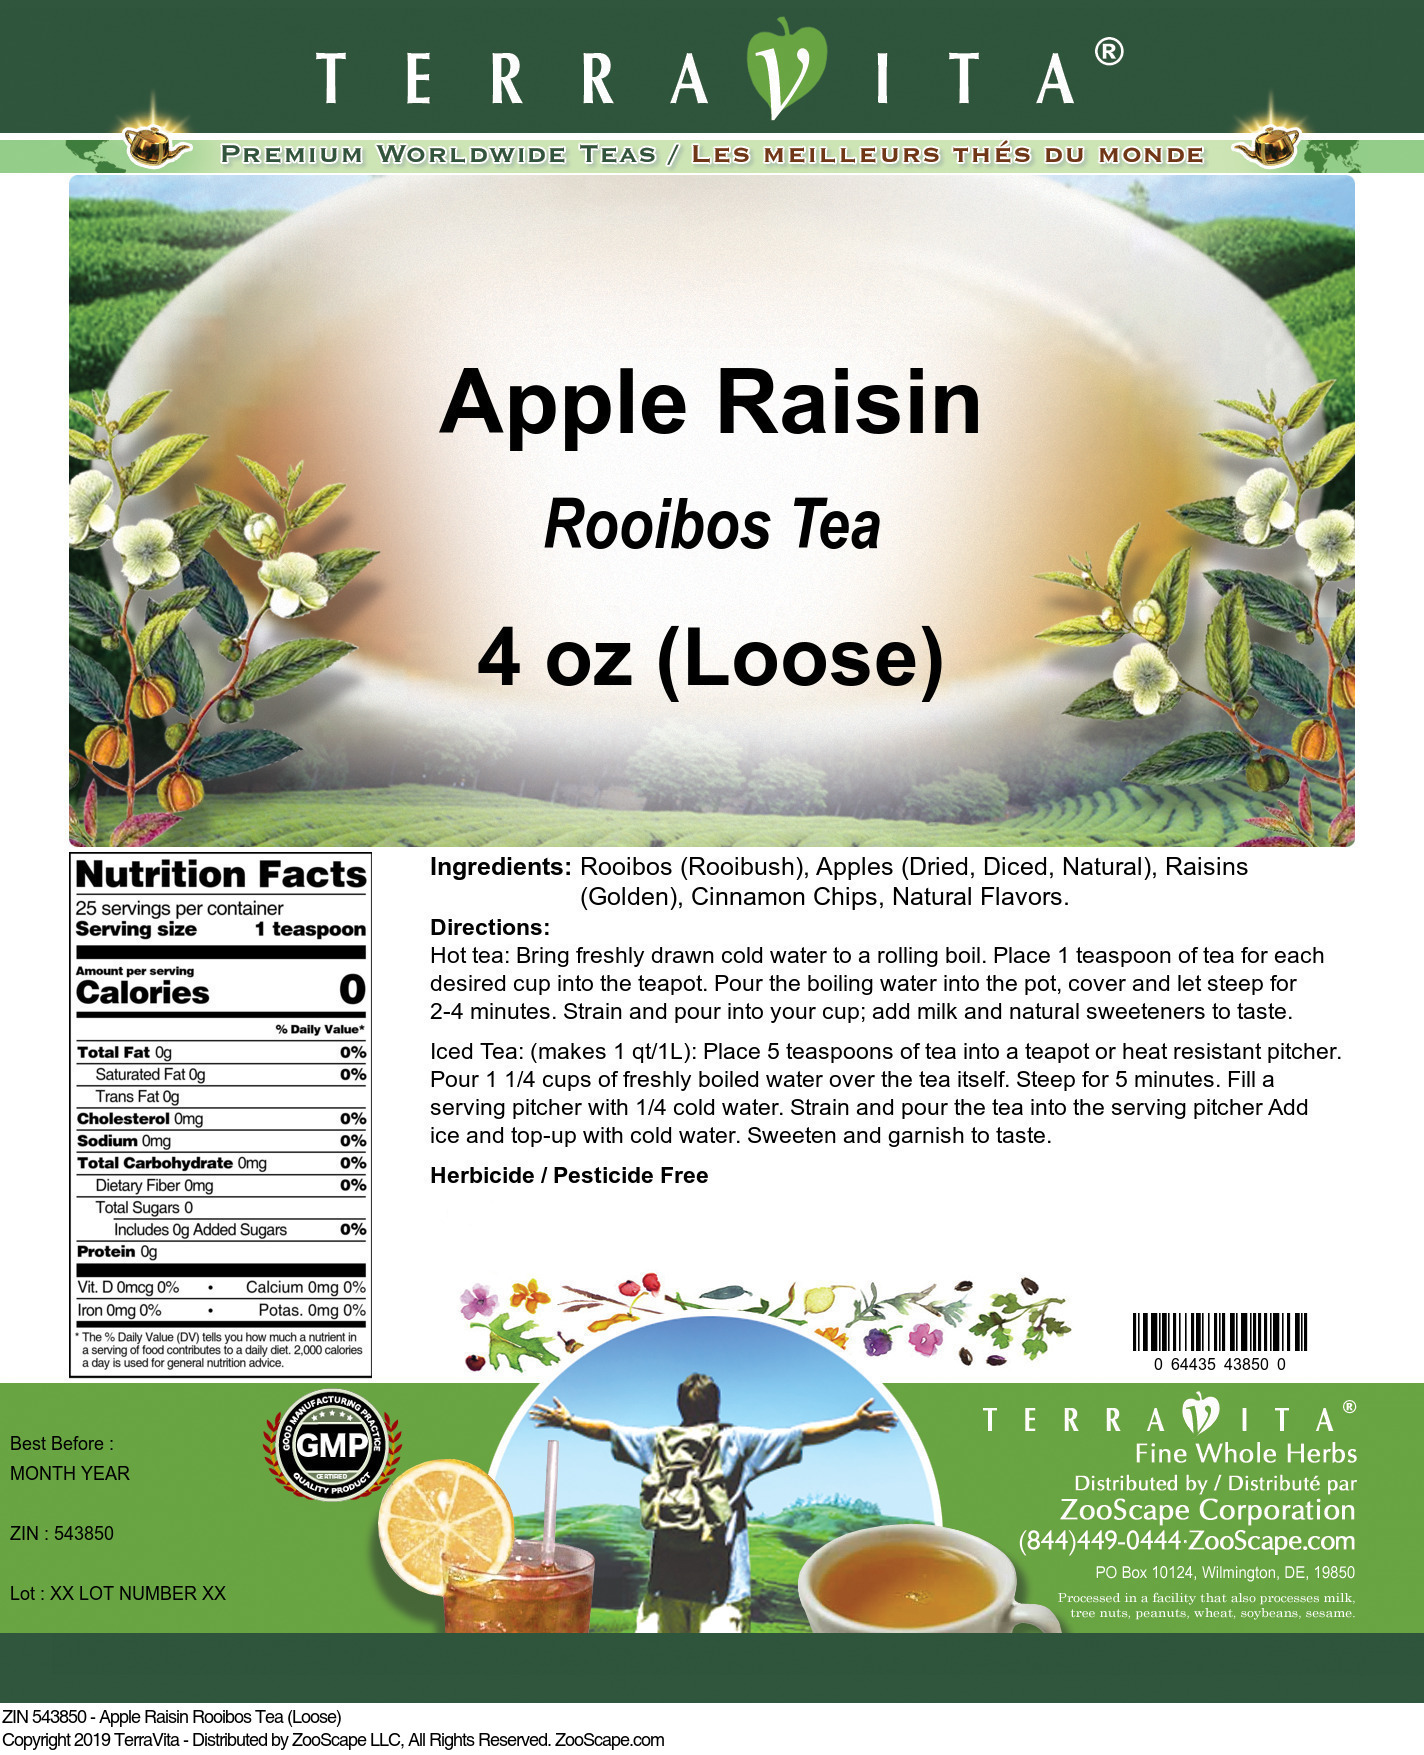 Apple Raisin Rooibos Tea (Loose)